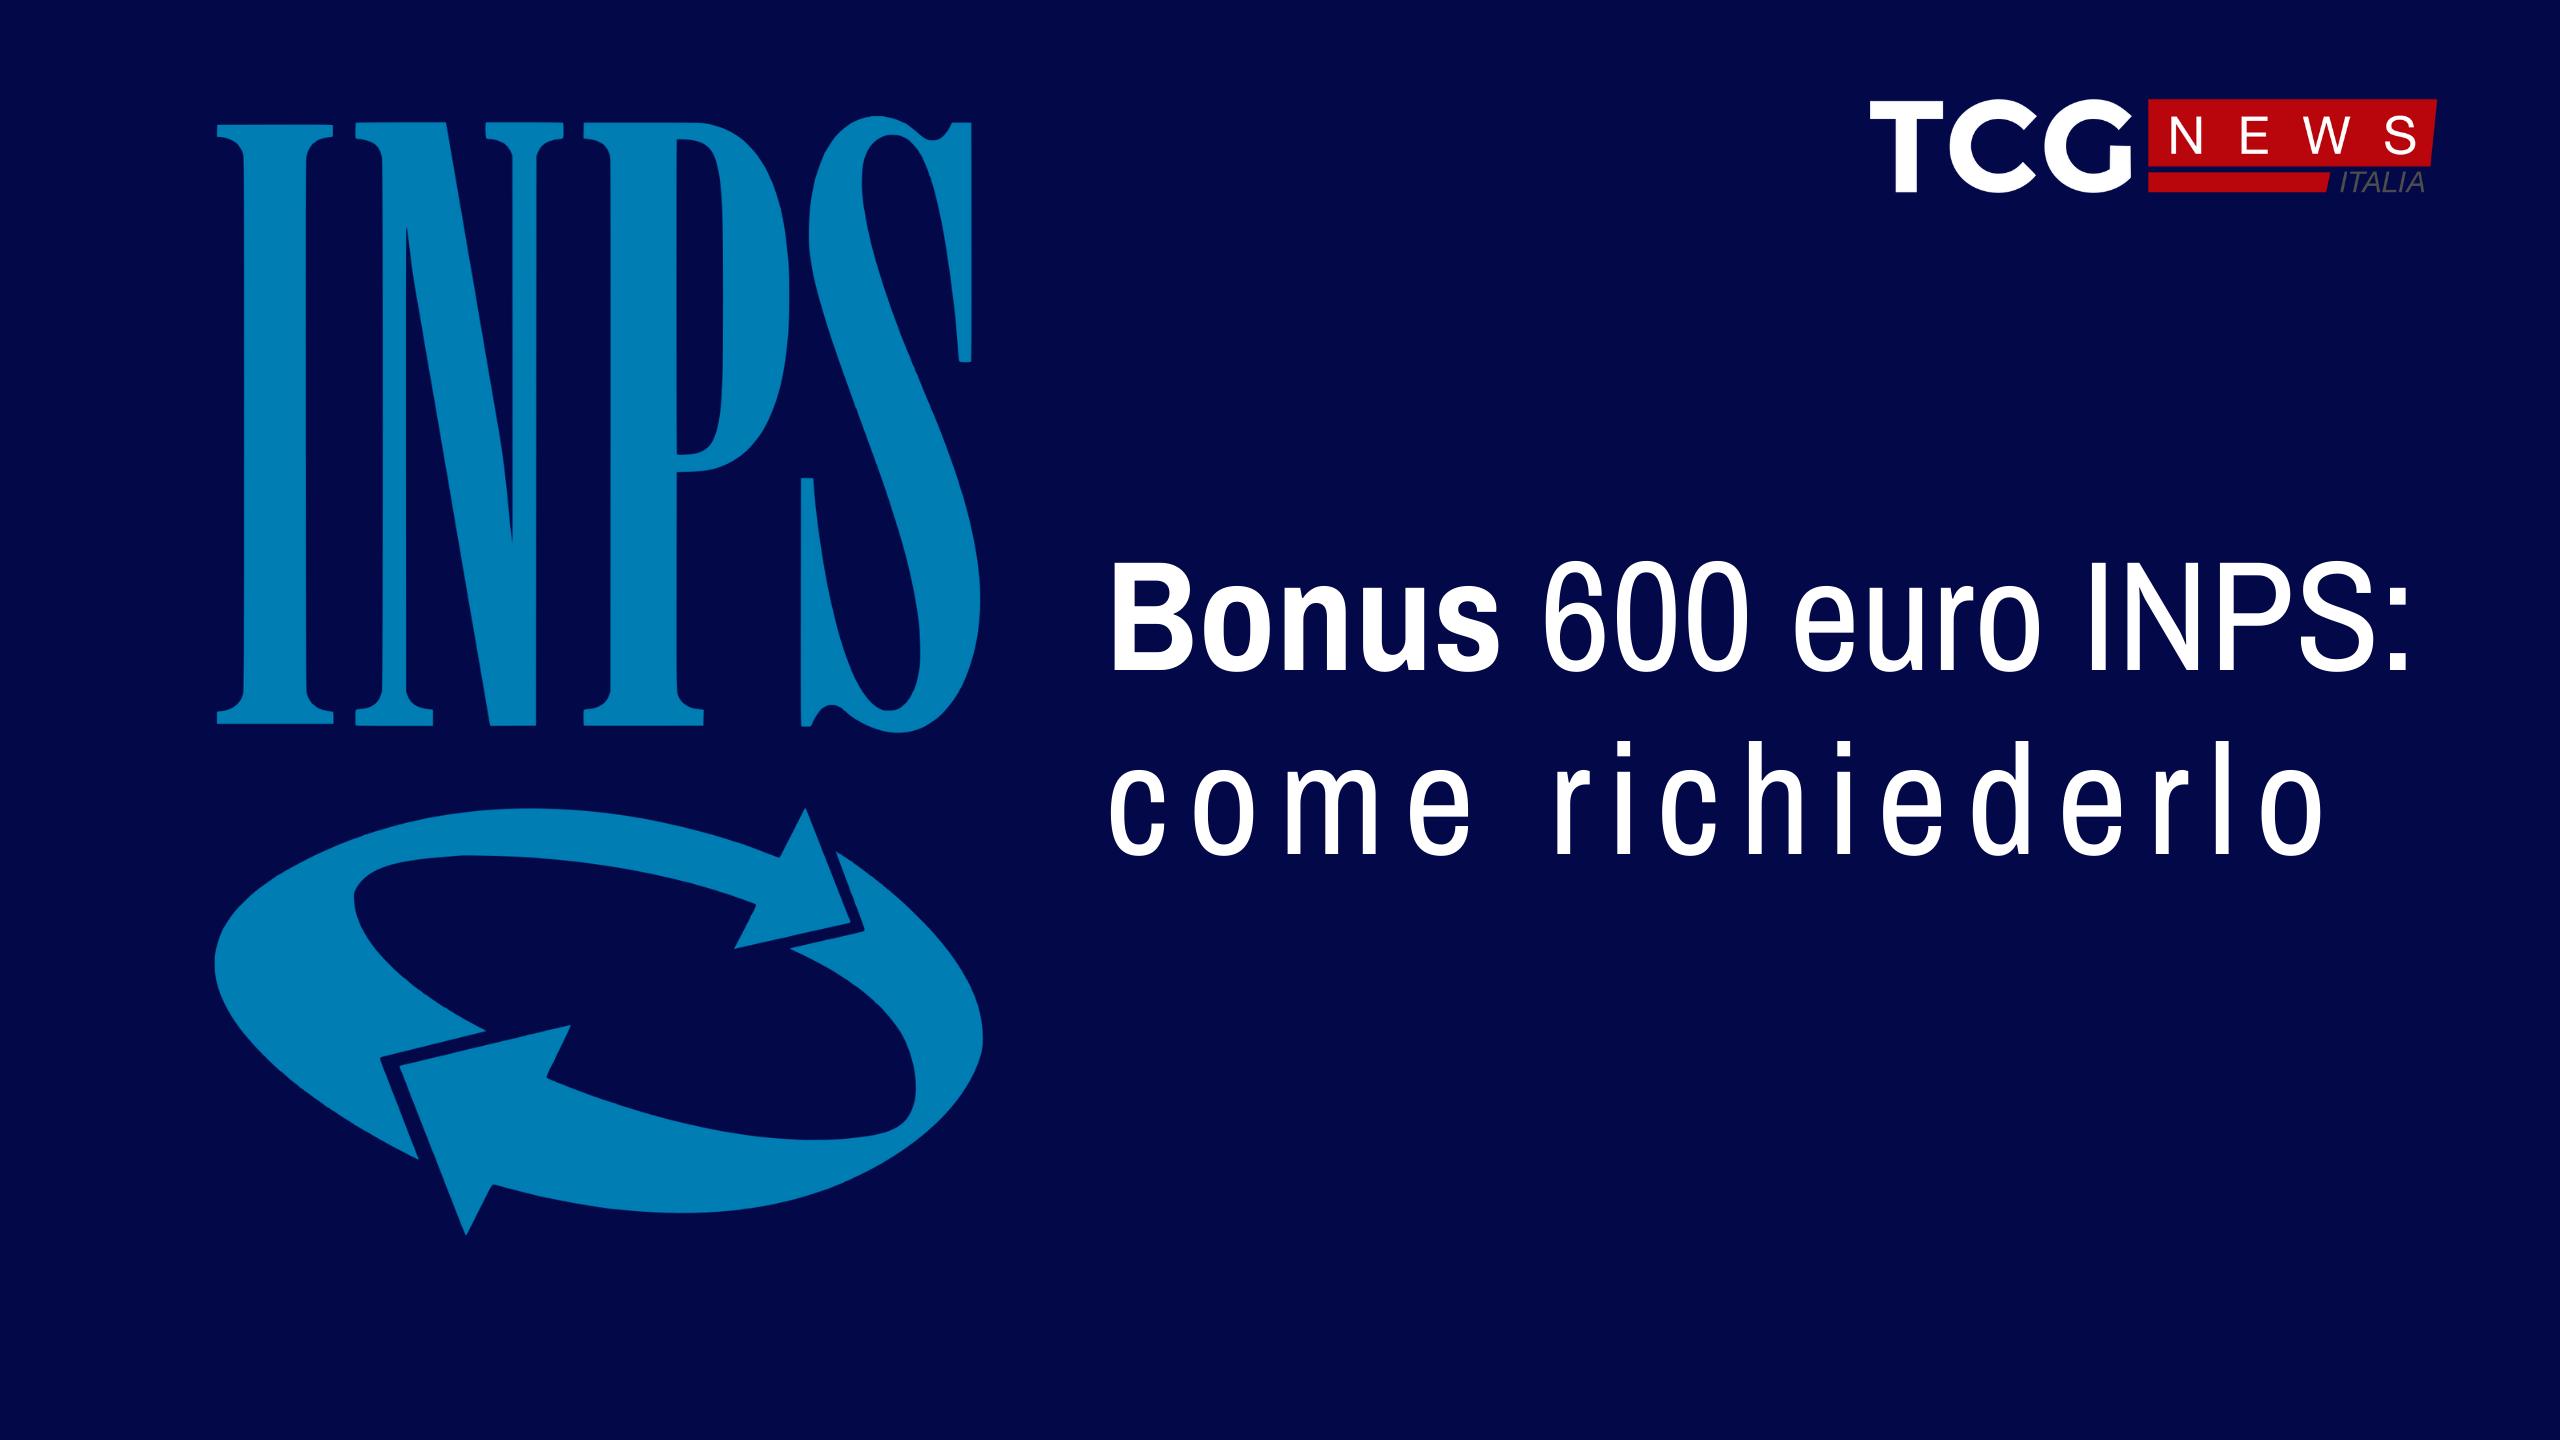 Bonus 600 euro INPS: come richiederlo